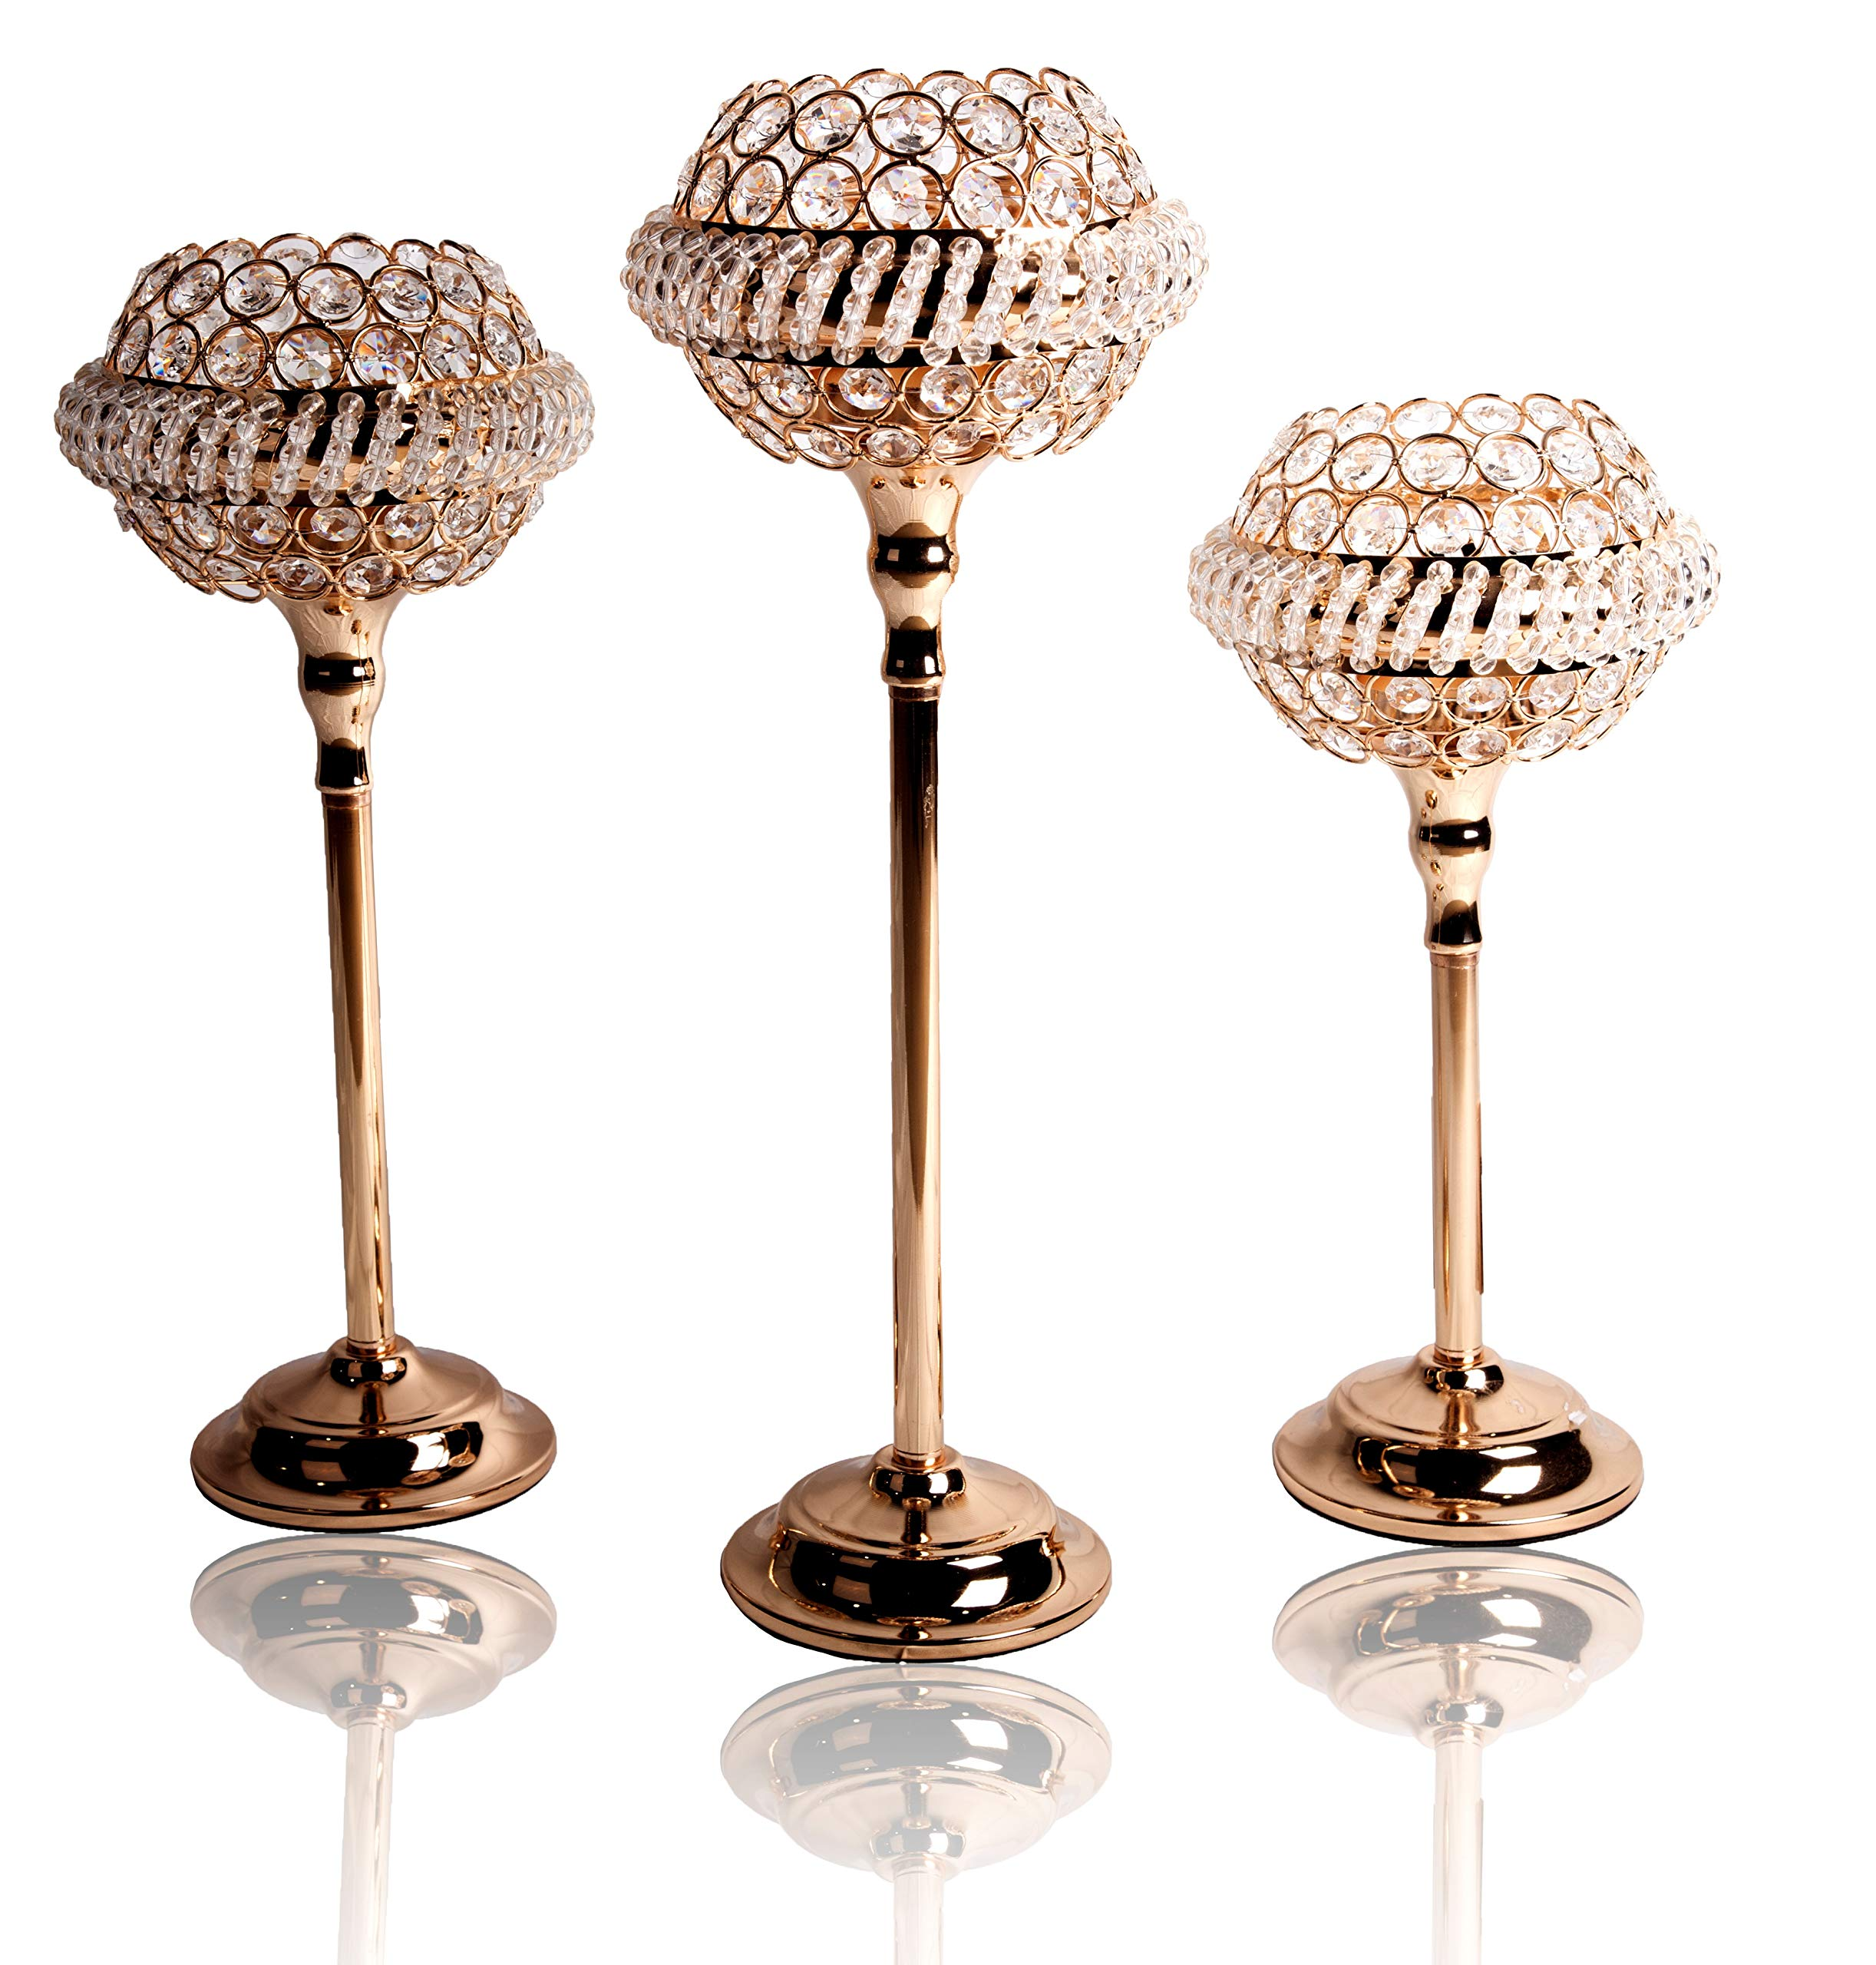 Prime Celebration Crystal Beaded Candle Holder Stand 3 Pieces Set 18 in H x 6 in W, 16 in H x 6 in W, 14 in H x 6 in W - Gold